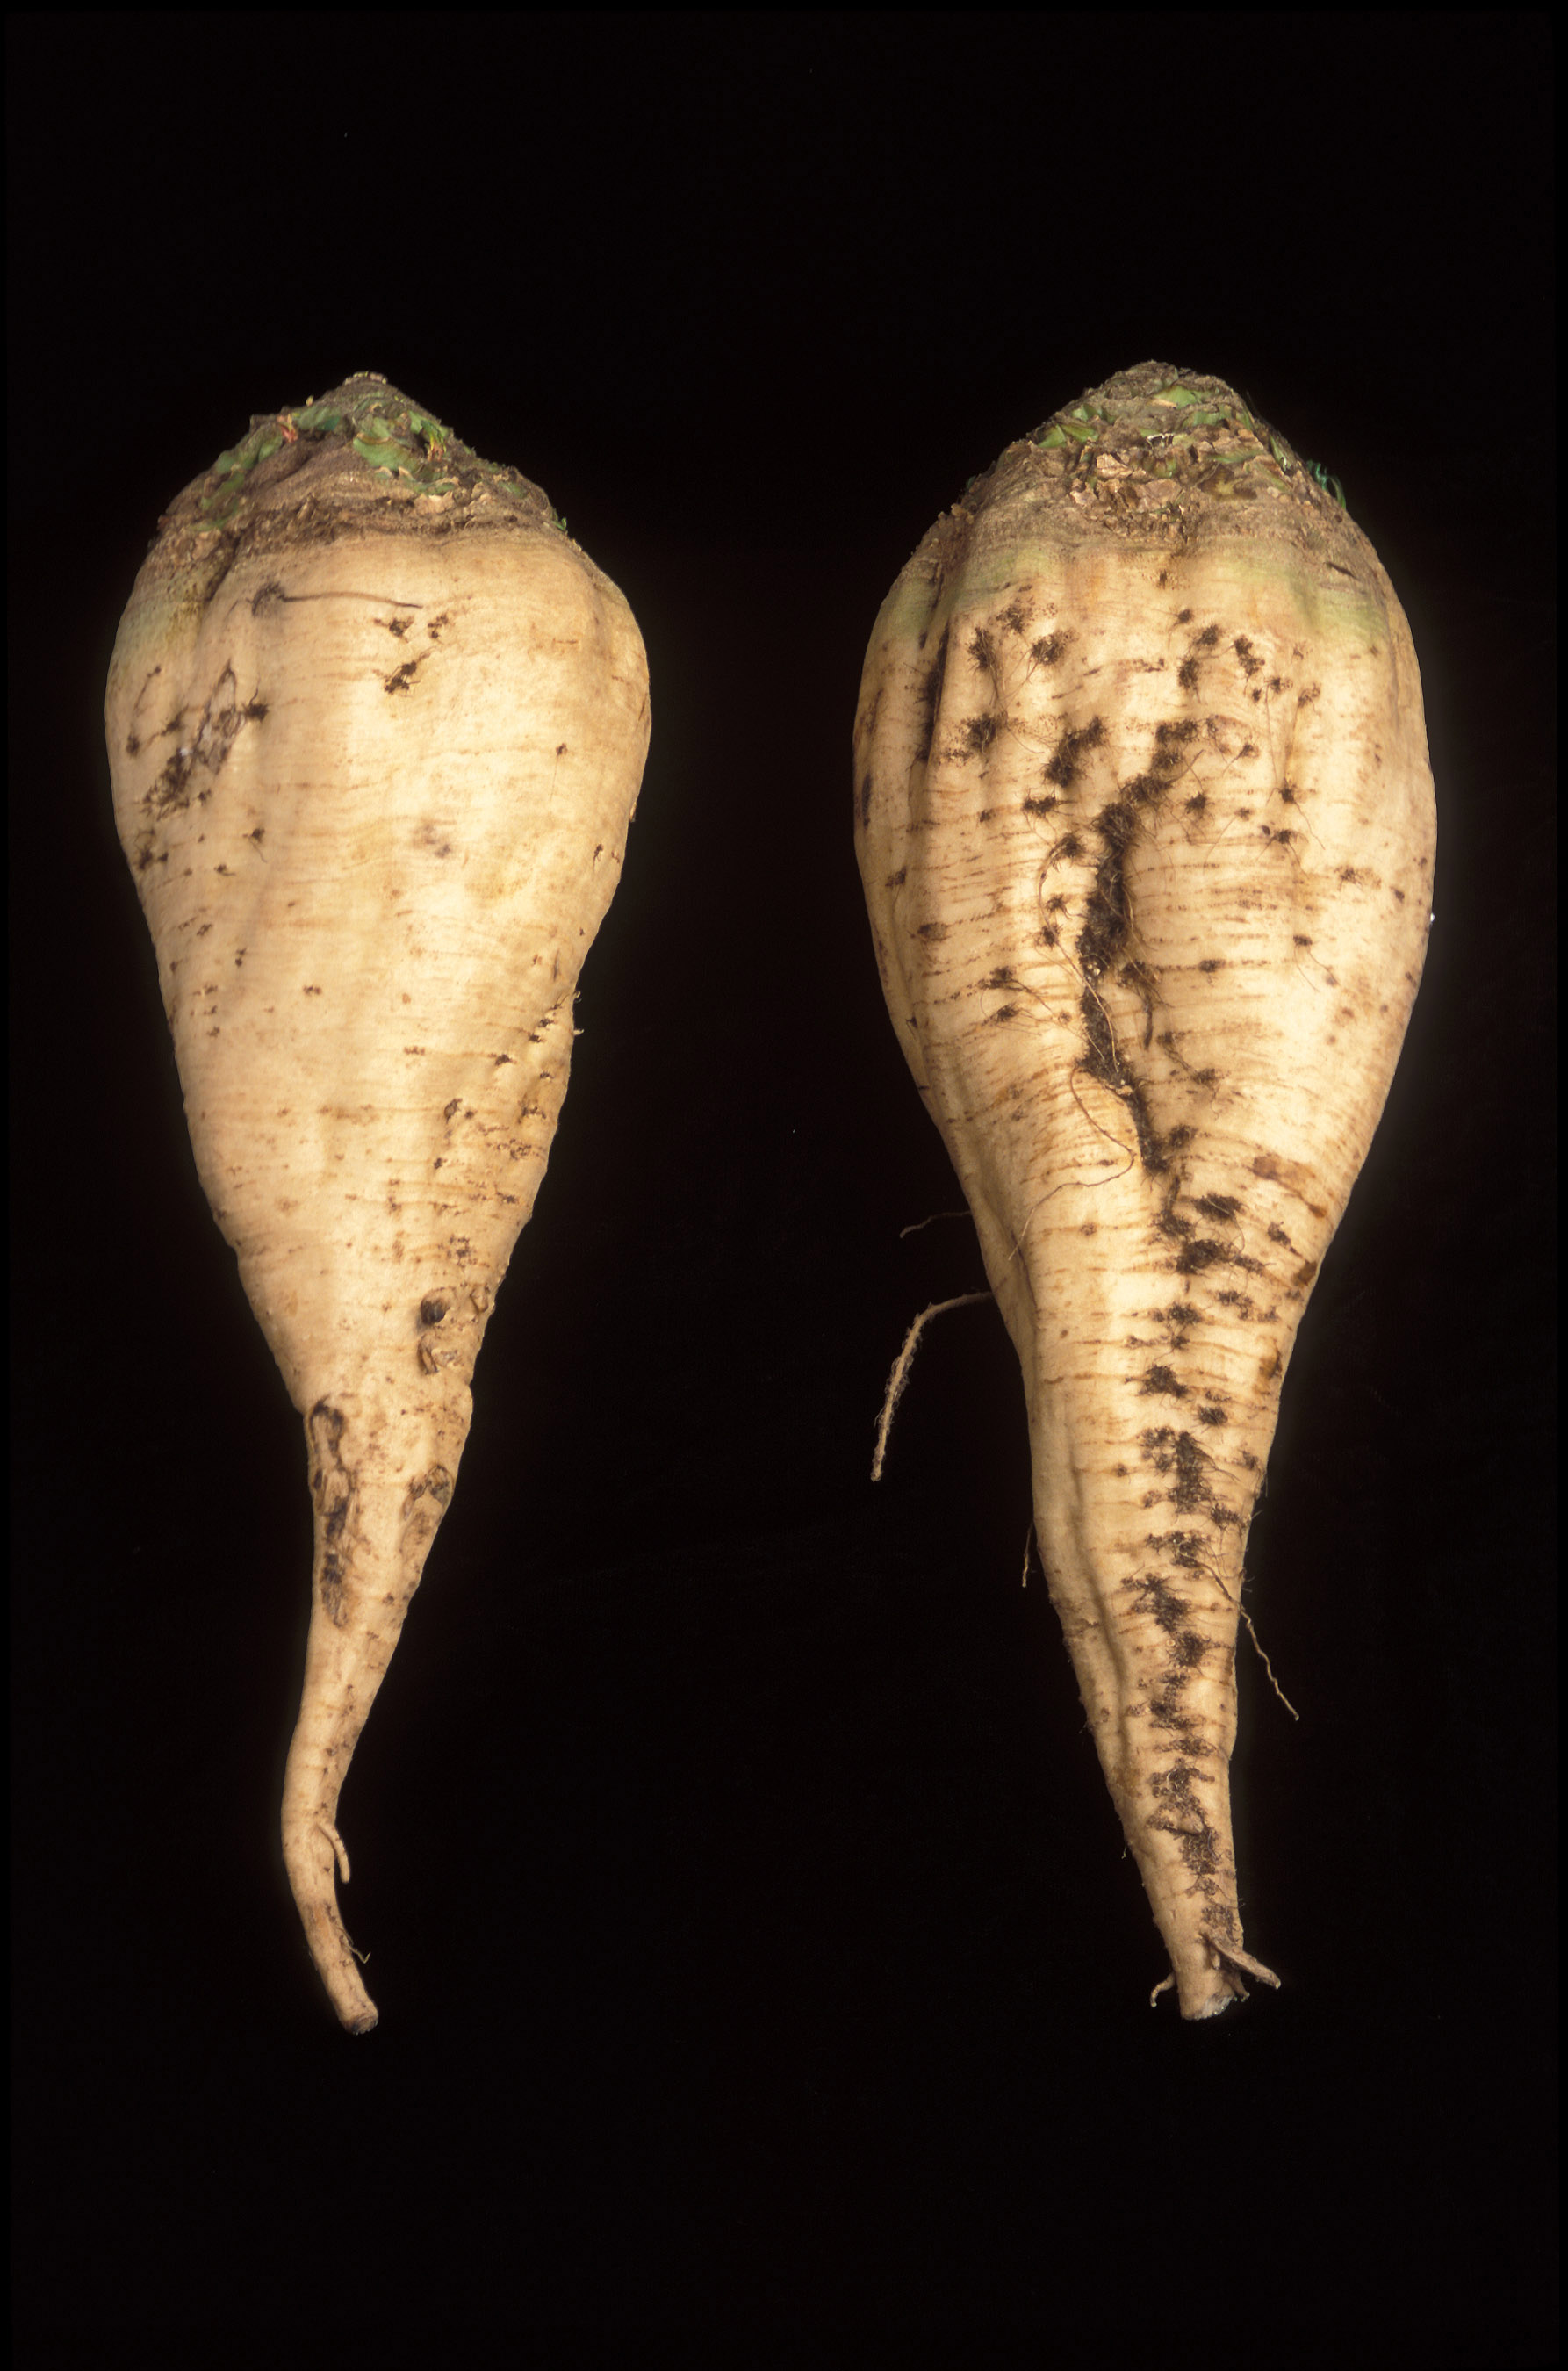 Wikipedia: Sugar Beet